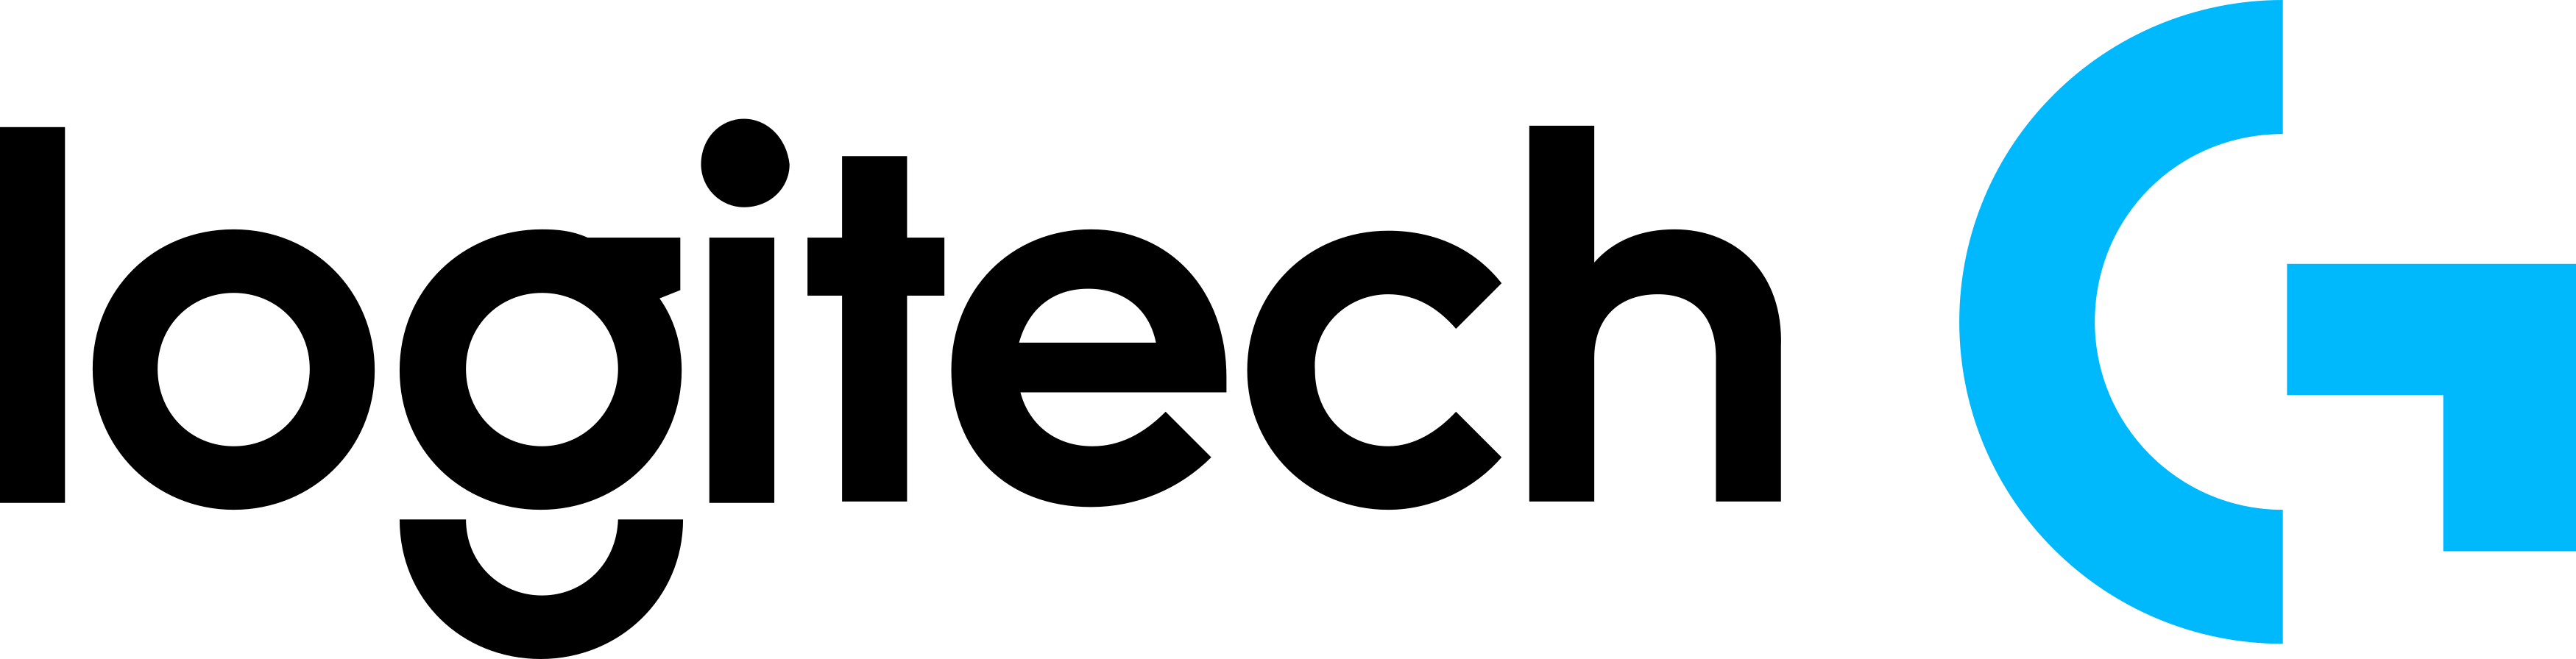 logitech logo.